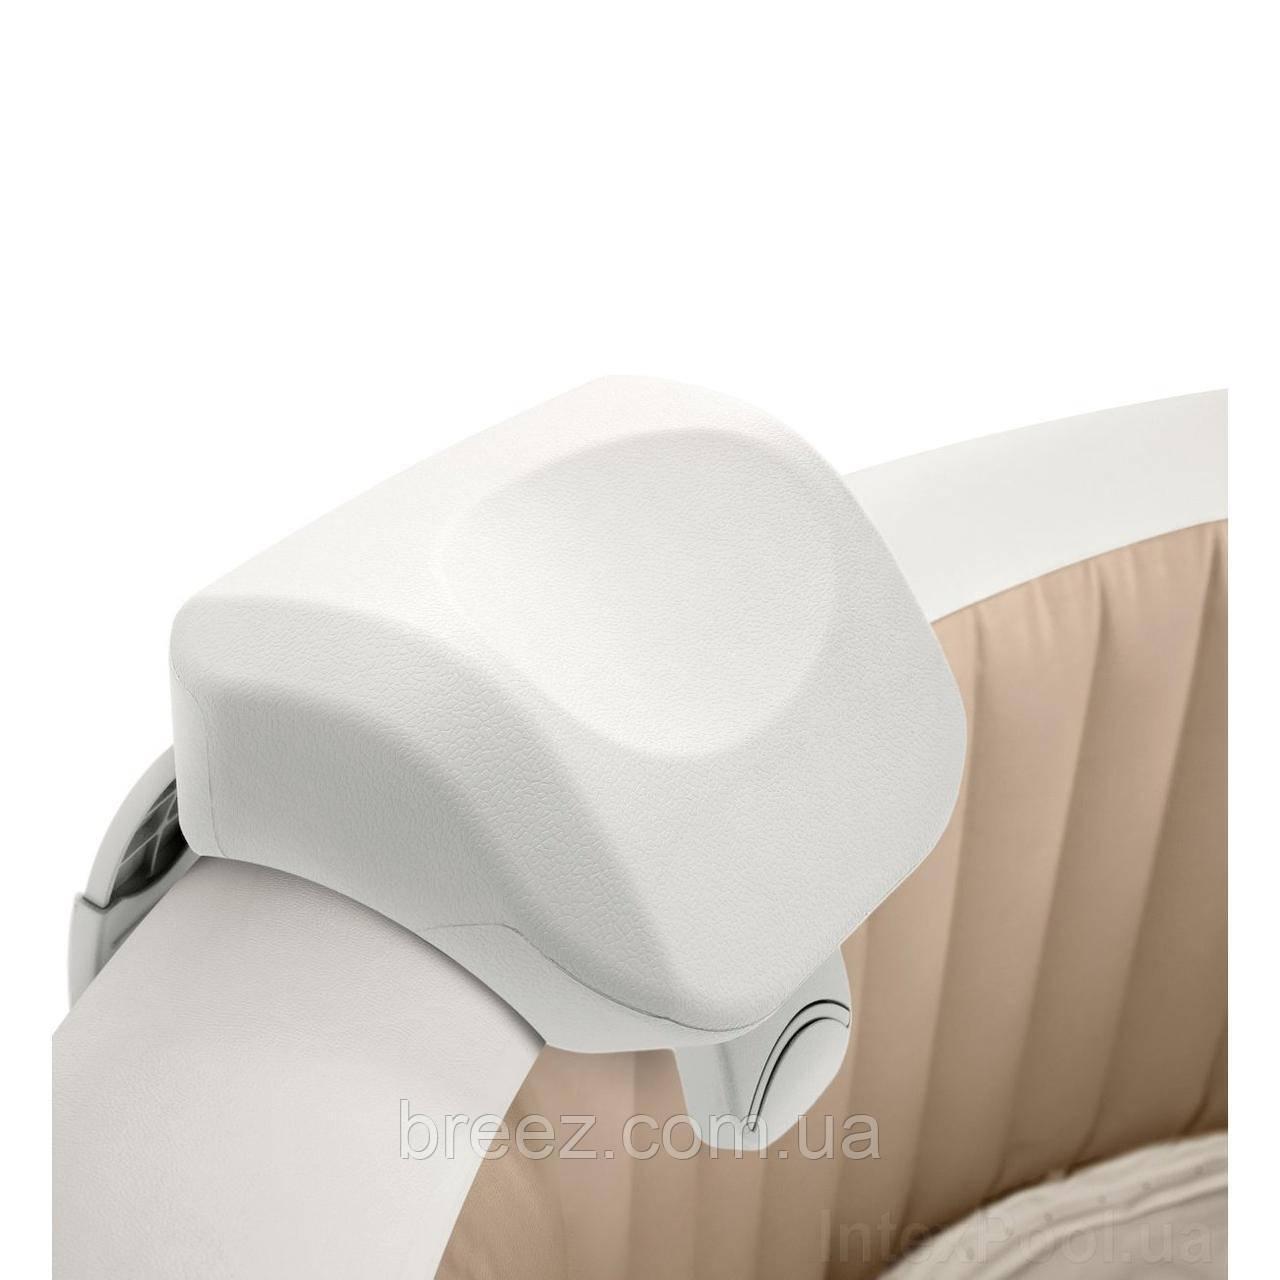 Подголовник для джакузи Intex 28 х 23 х 17 см